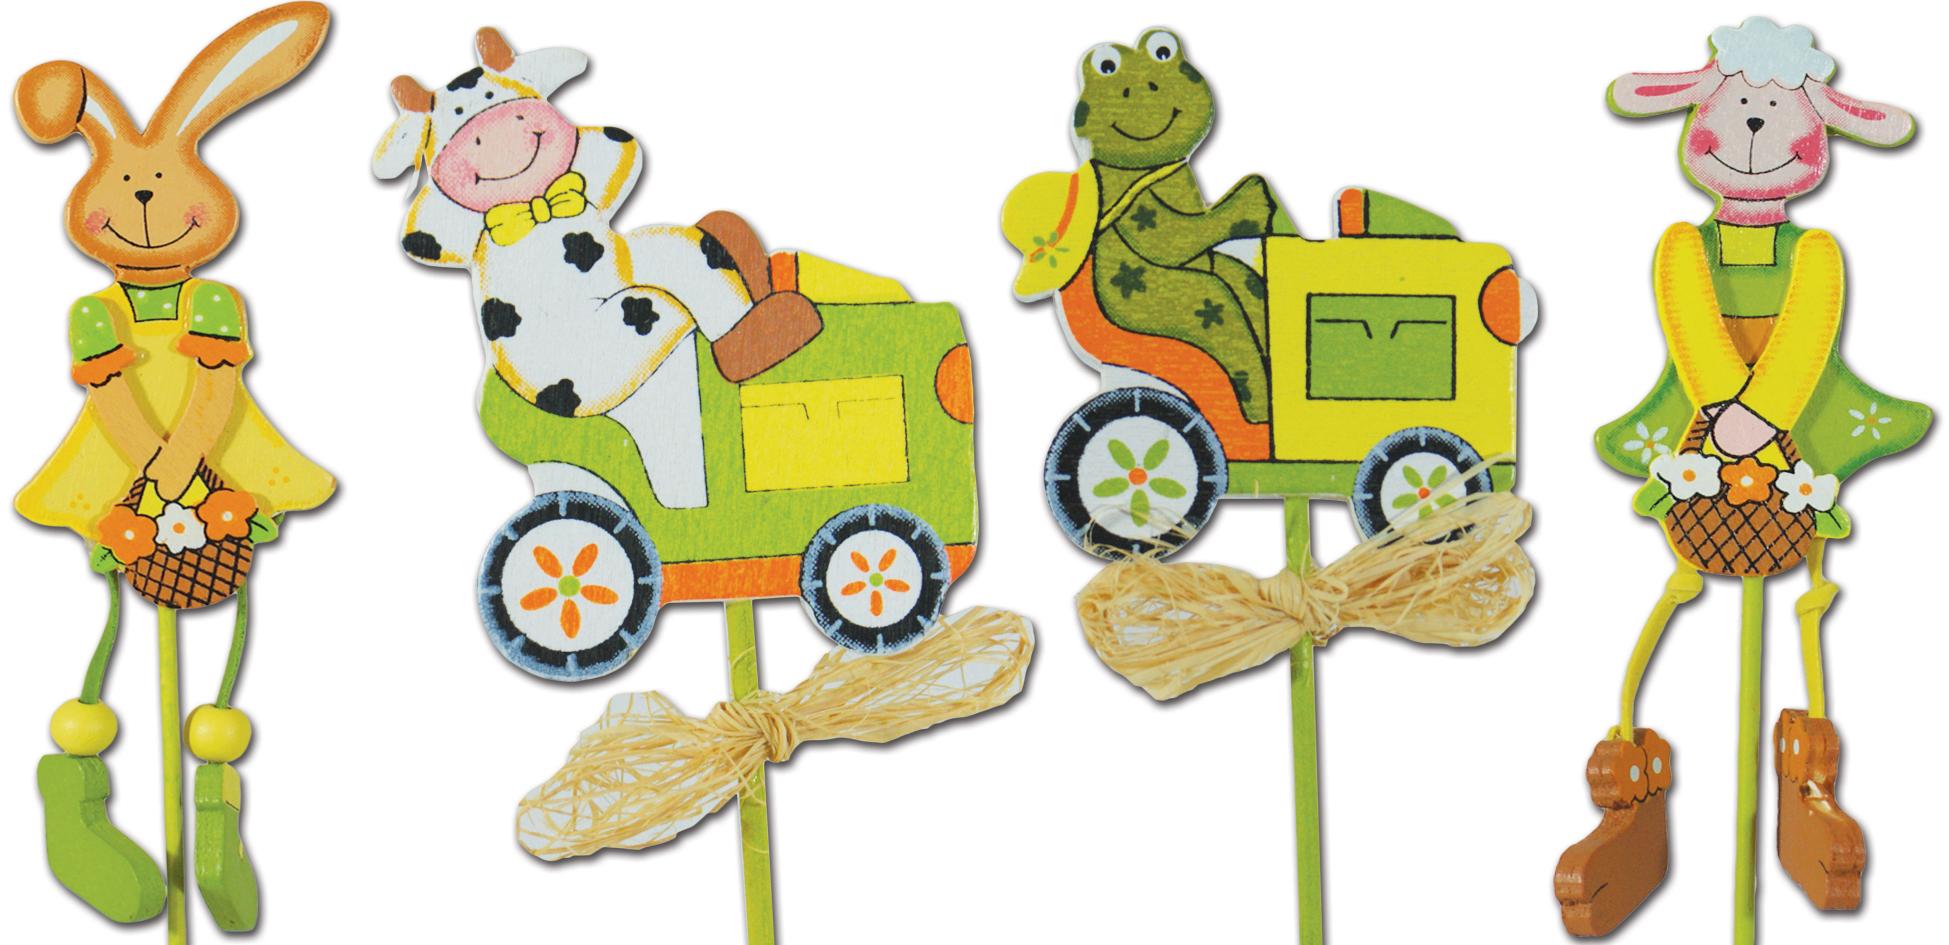 Dekofiguren Aus Holz Fachgrosshandel Haack